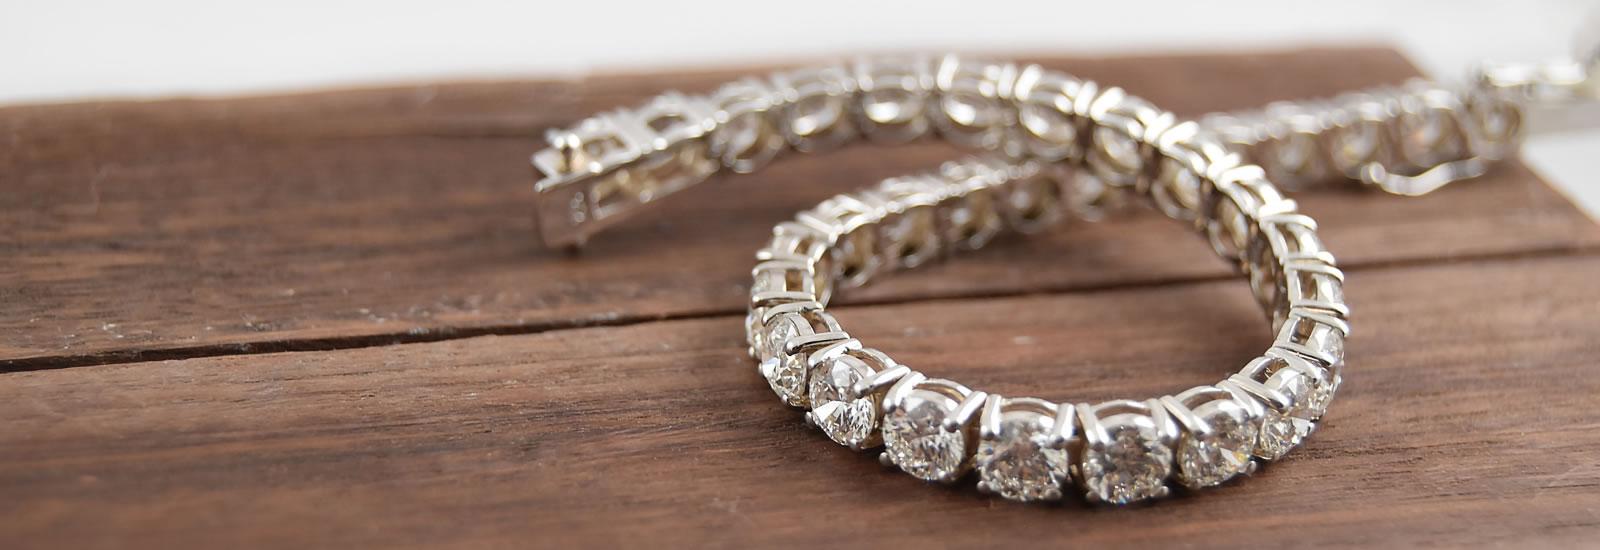 Custom Design Jewellery Perth